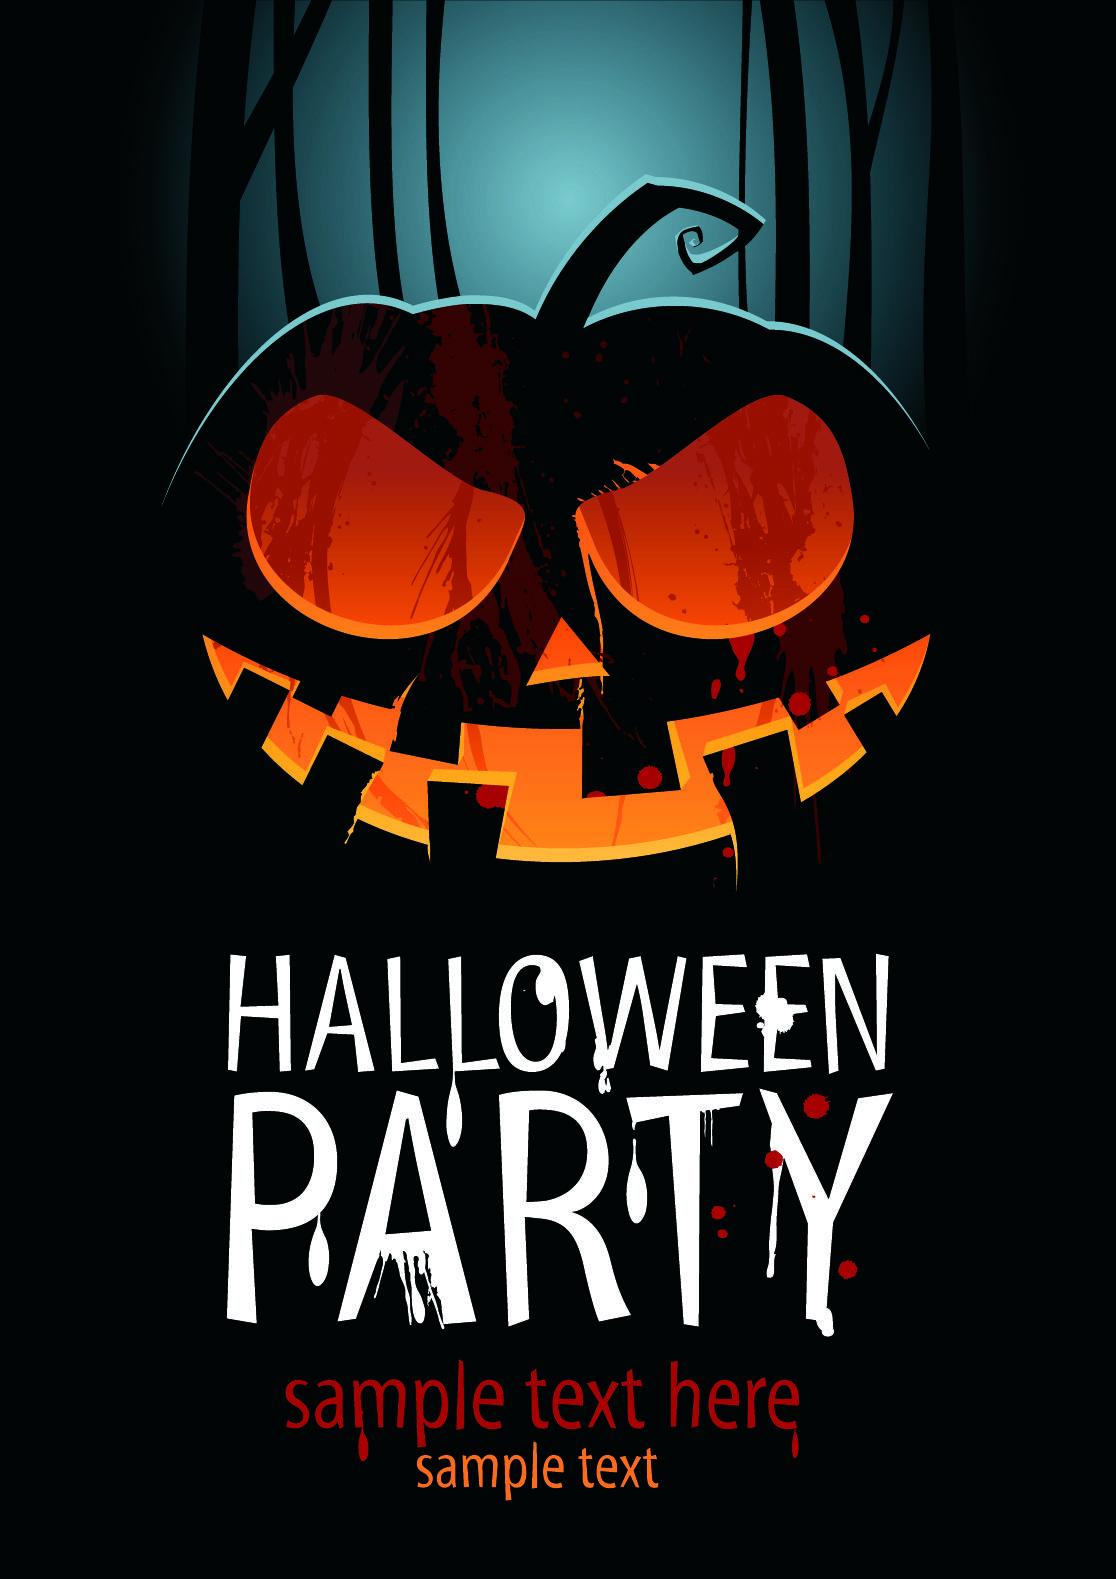 Free vector Halloween posters beautiful background vector